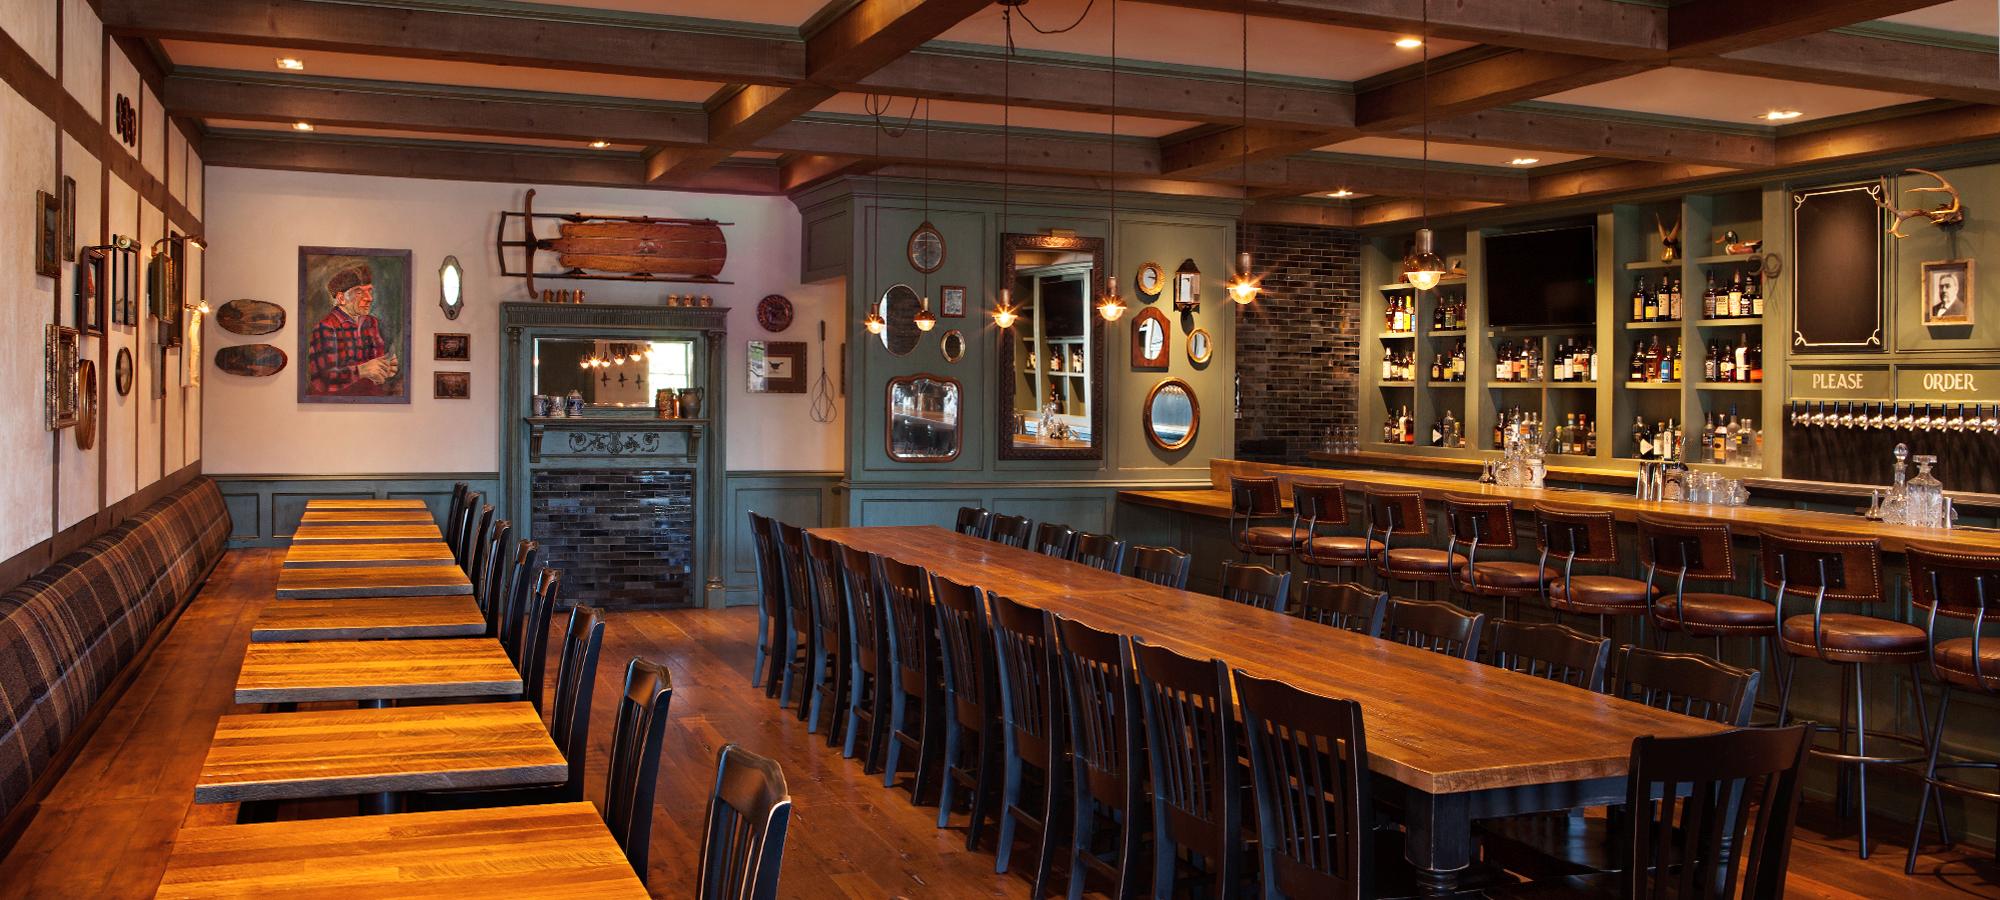 beleco_interiors_formans_tavern_toluca_lake_header